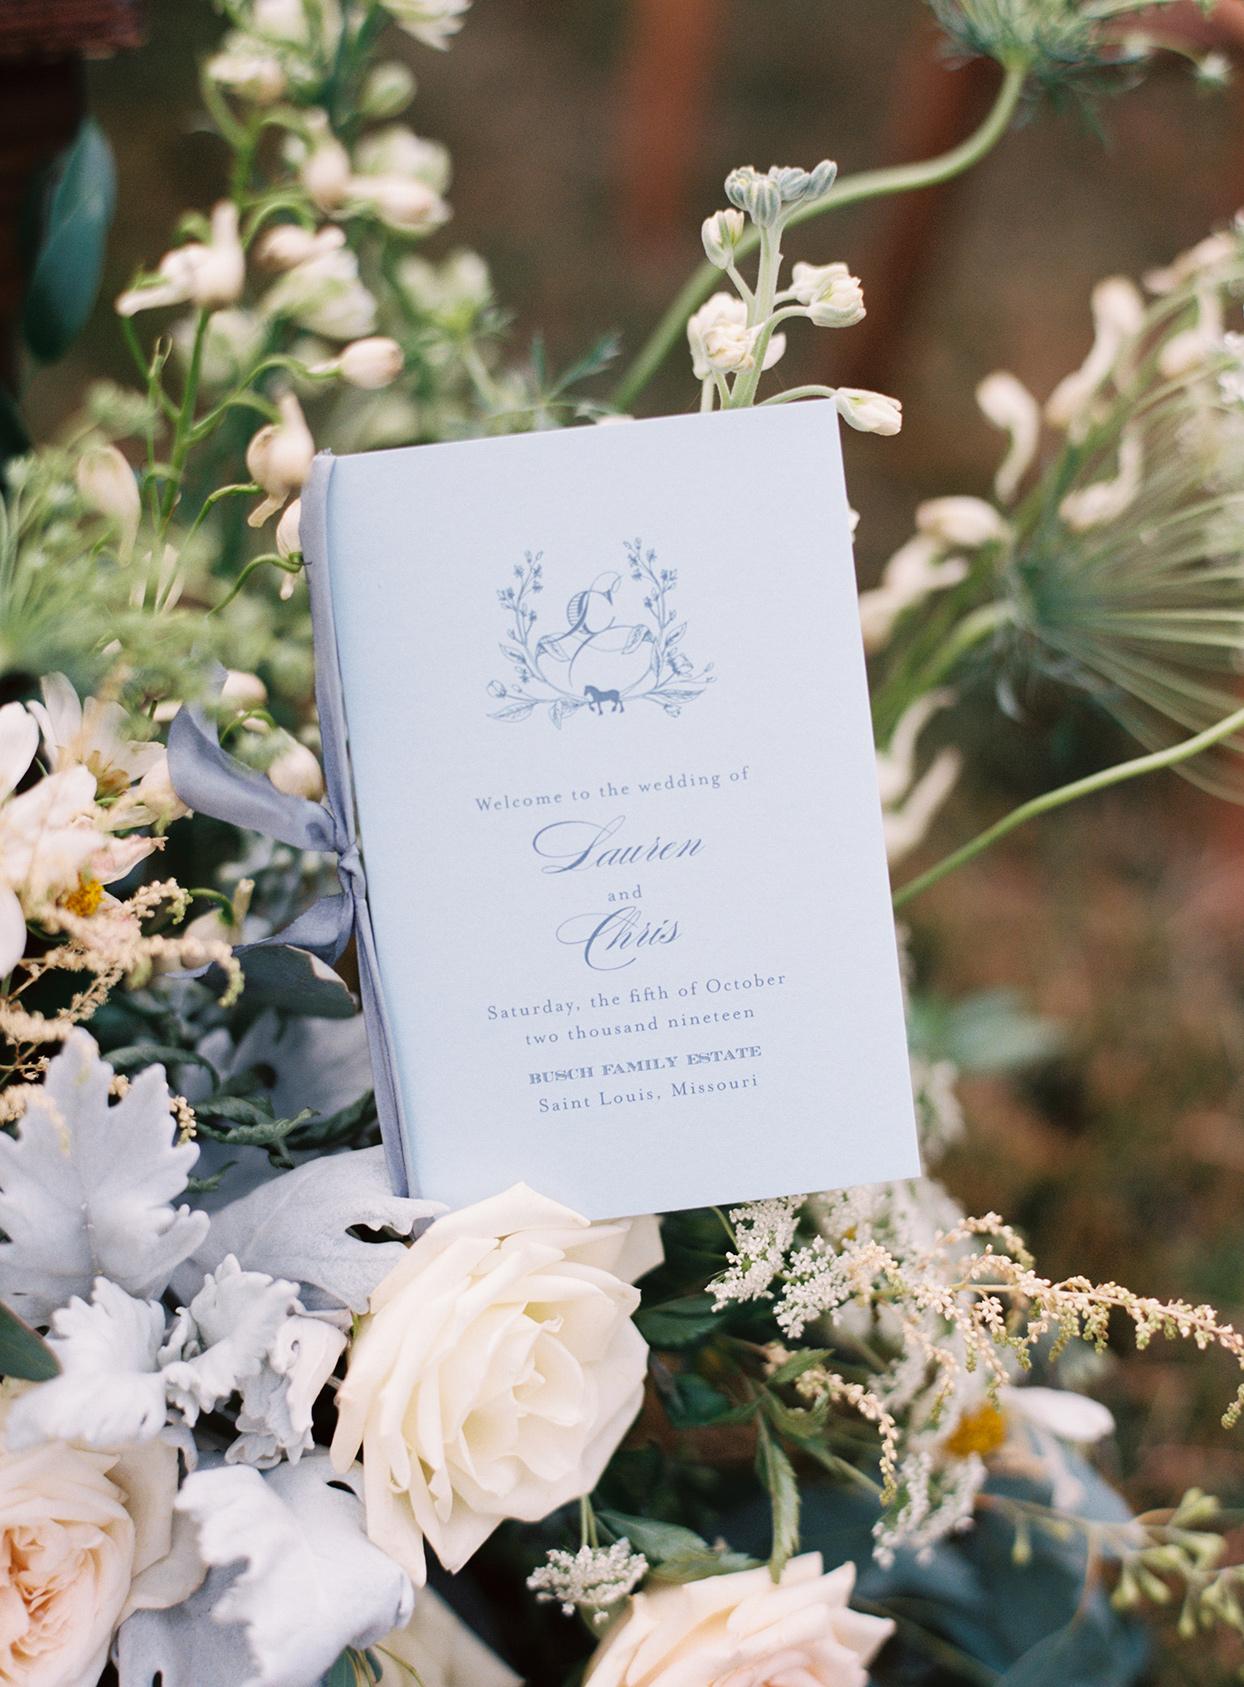 lauren chris wedding pastel blue ceremony program